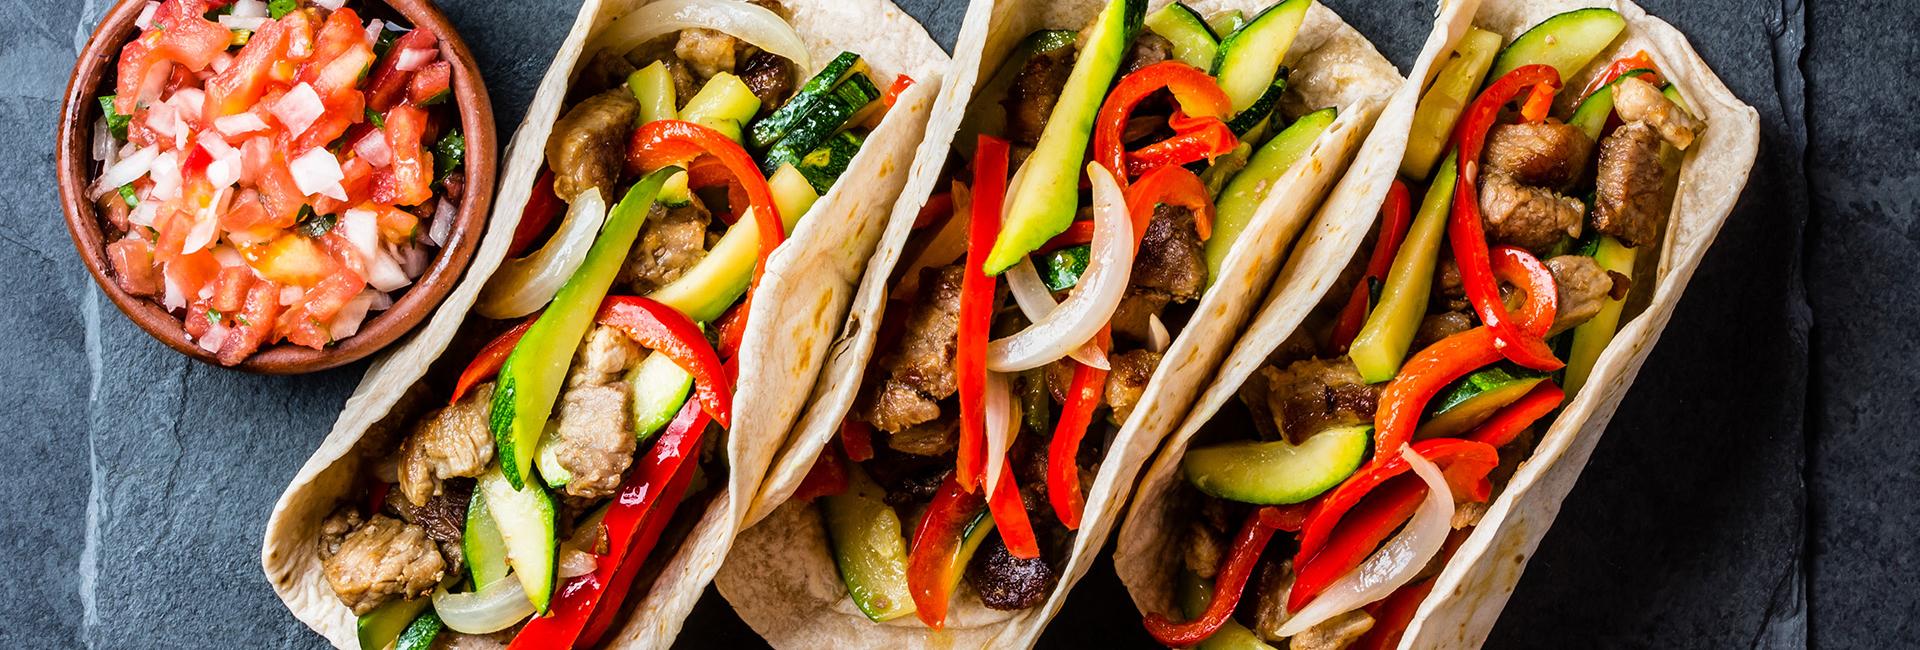 Viva! Mexican Cuisine